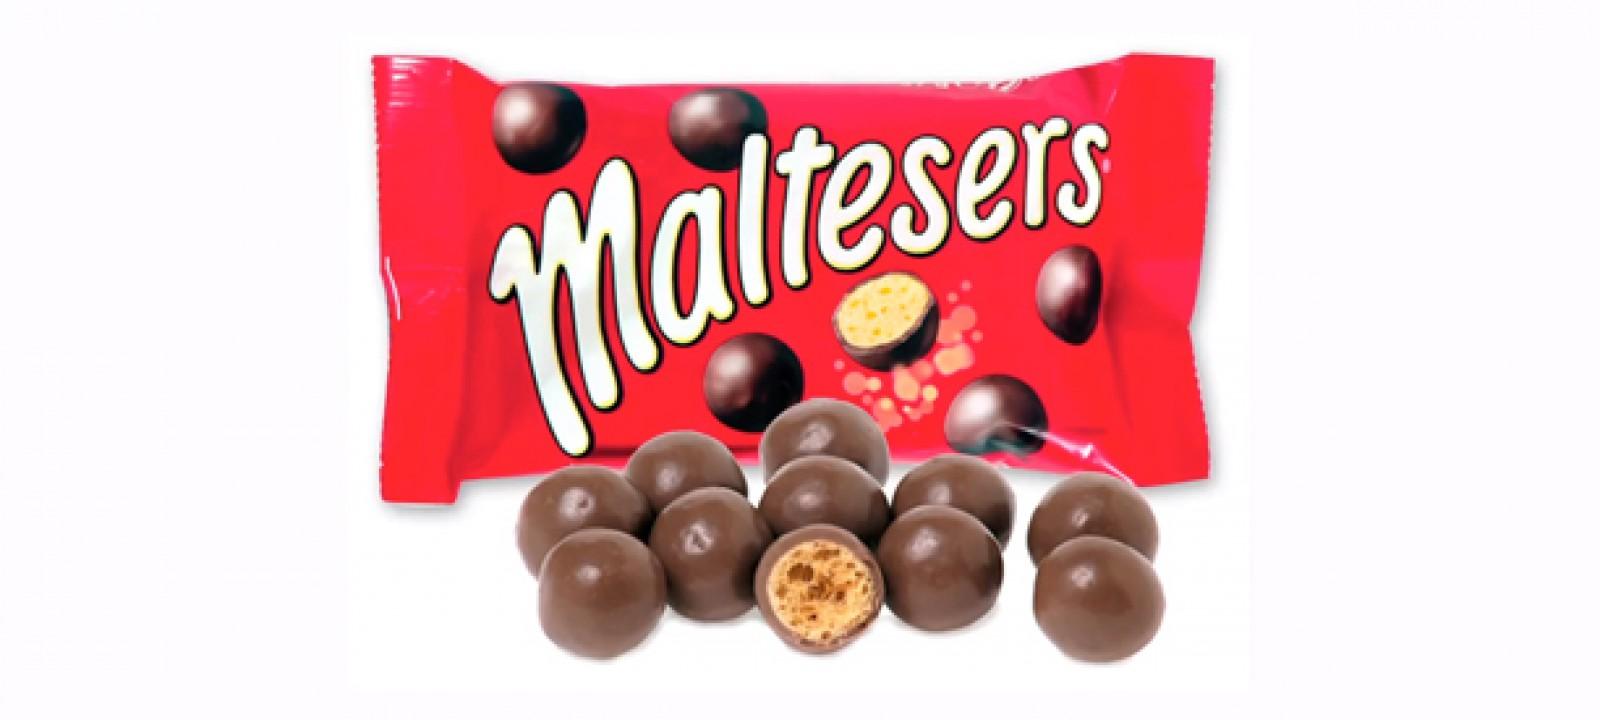 612x344_maltesers